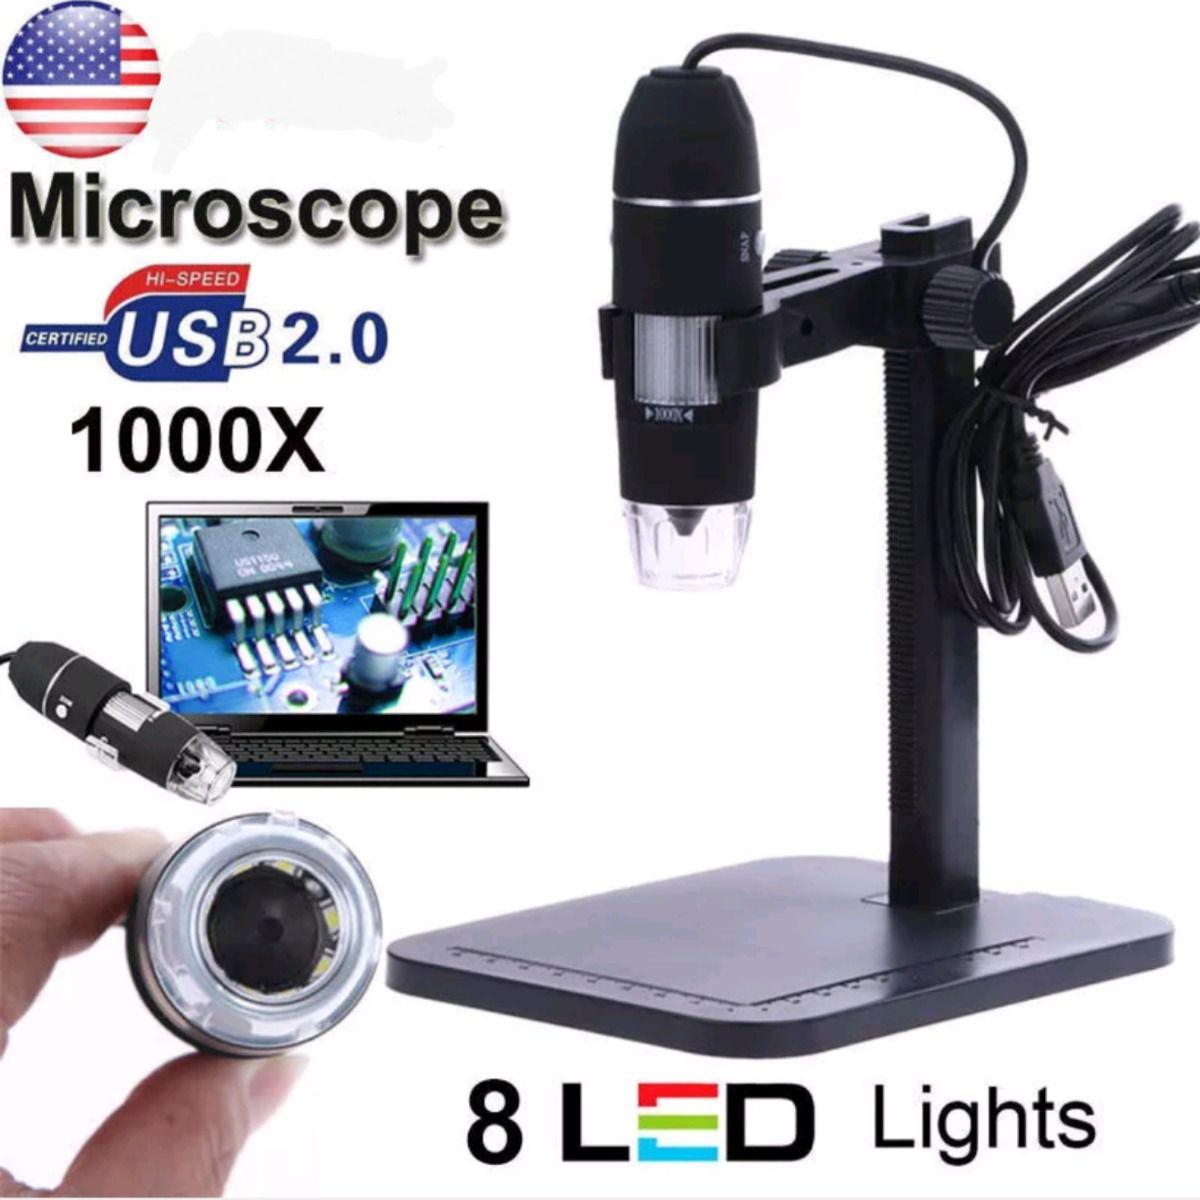 Microscopio Digital USB 1000x  - MRE Ferramentas